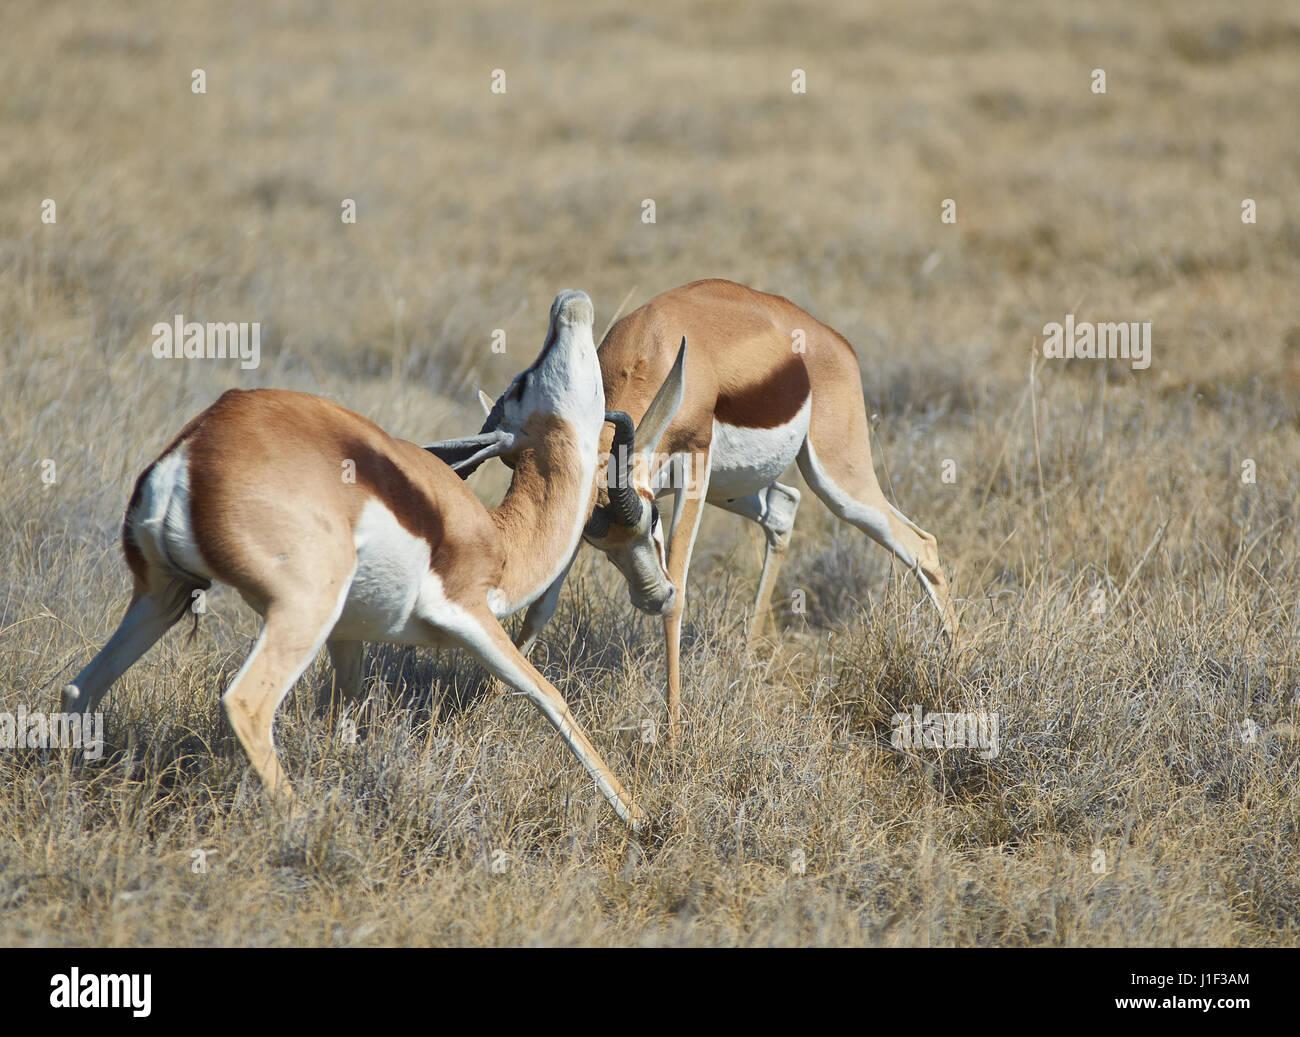 Male springok (Antidorcas marsupialis) fighting in Etosha National Park, Namibia - Stock Image